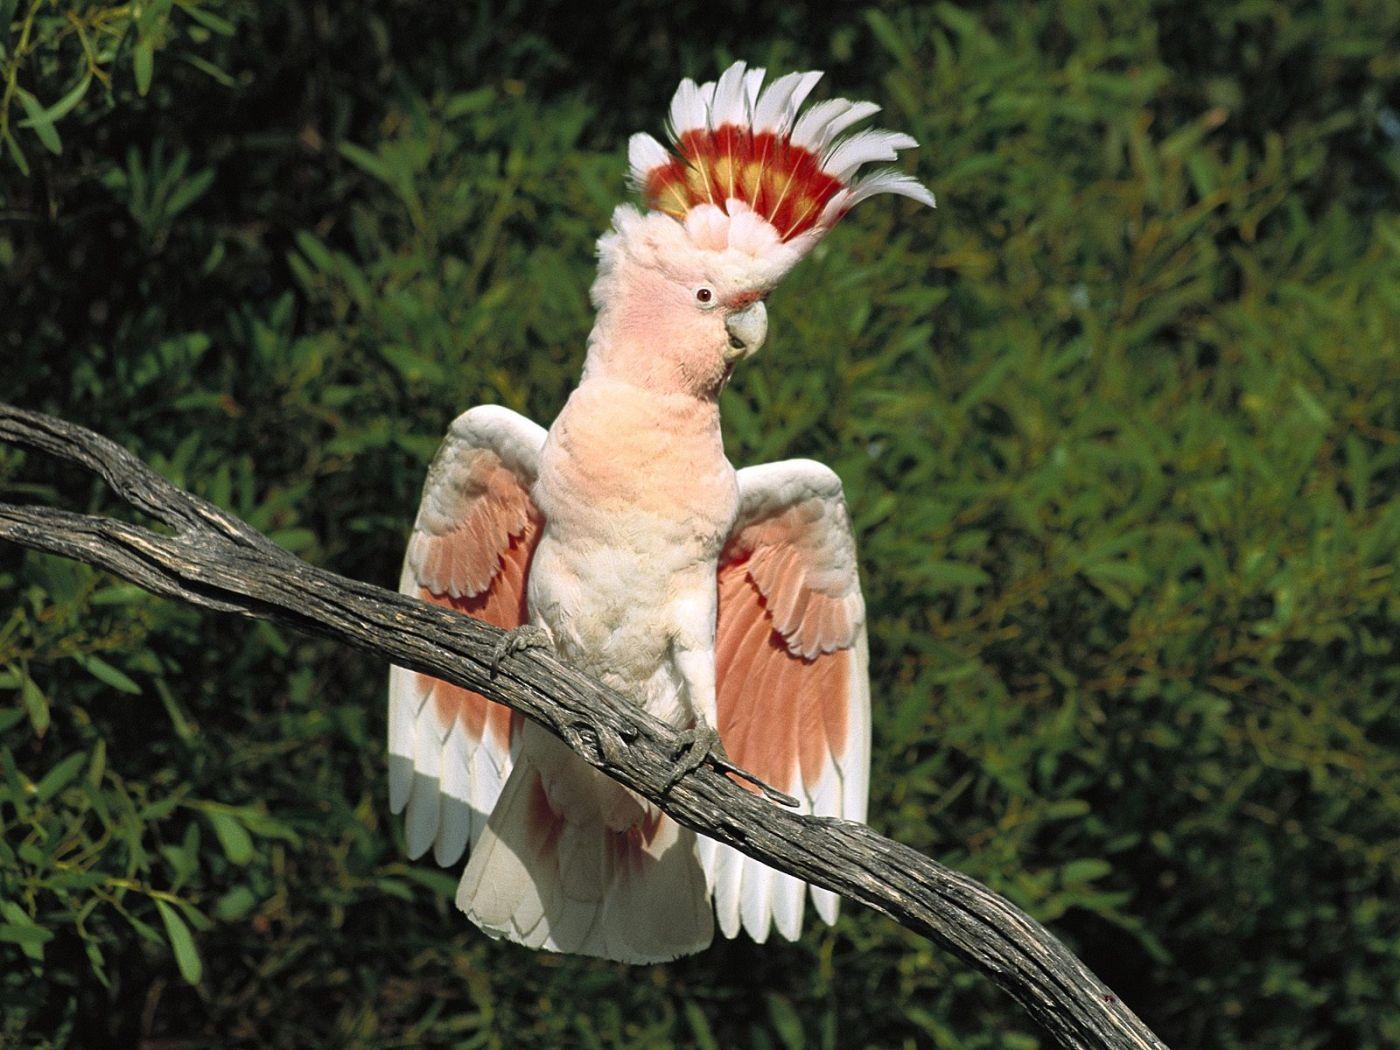 Pink Exotic Bird On Tree Branch Wallpaper 1400x1050